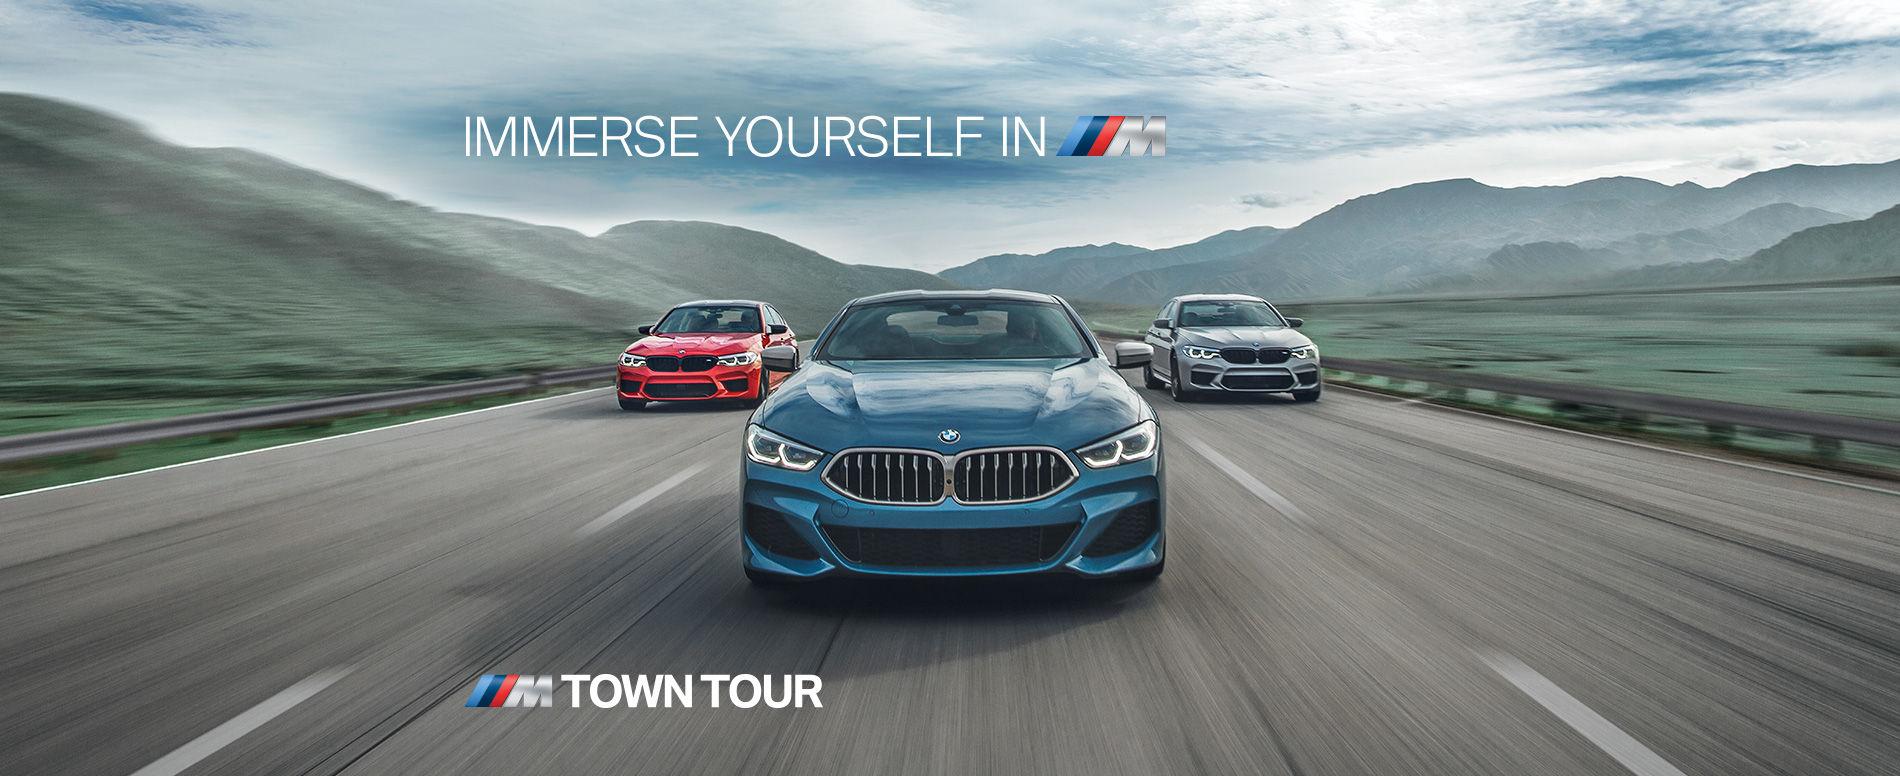 M Town Tour